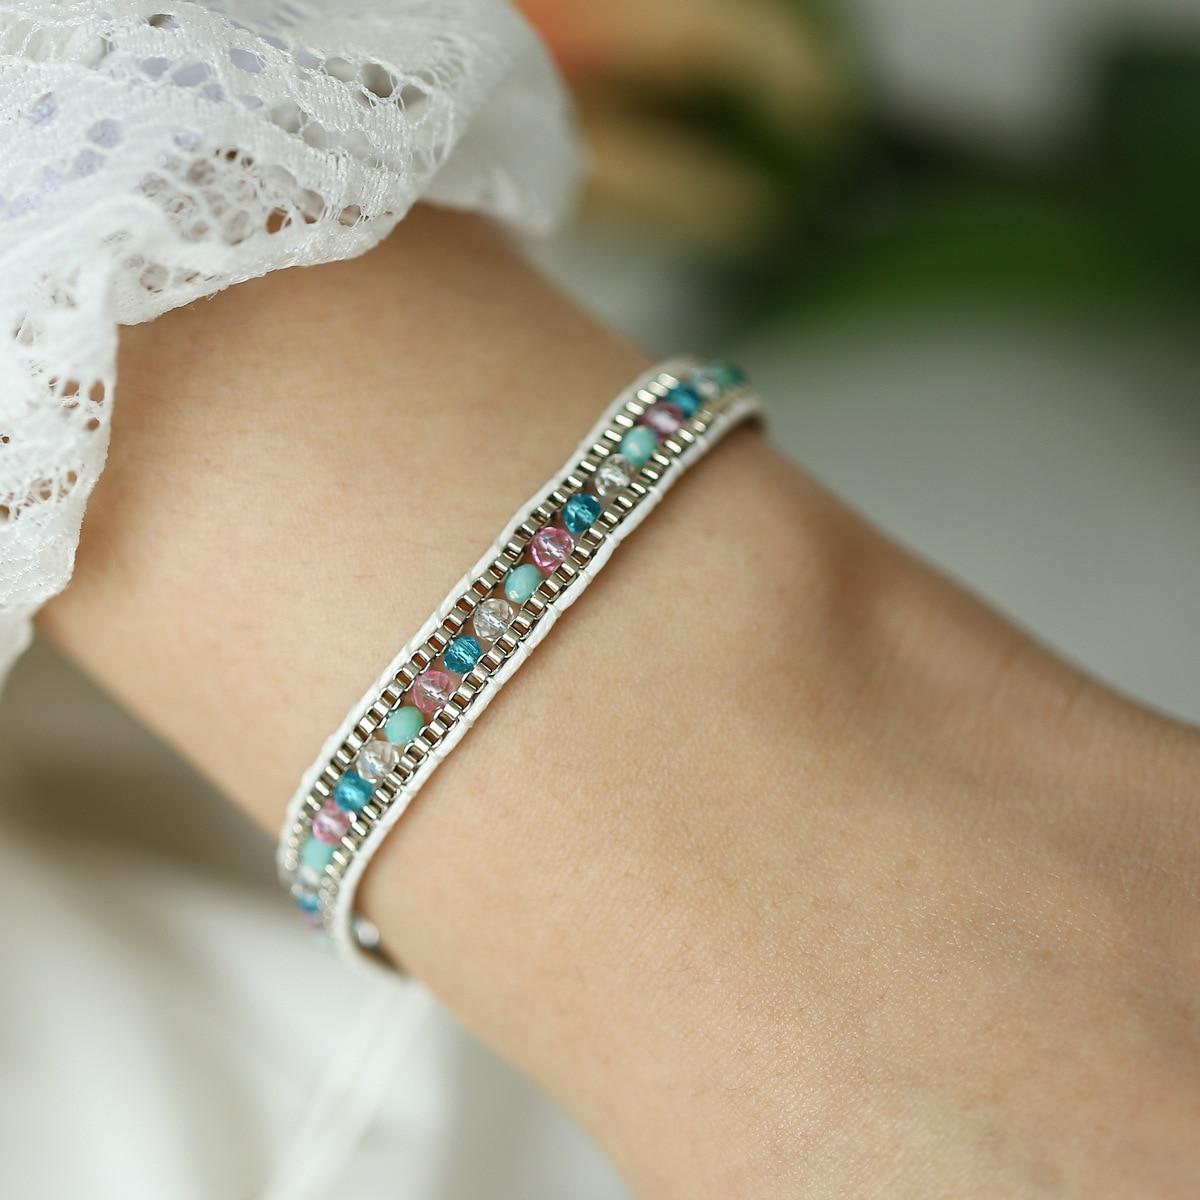 Boho style push pull Bracelet Braided Cloth Bracelet Jewelry Gift Boho Fashion Bohemian Chain Jewelry Cloth Fabric Bracelets